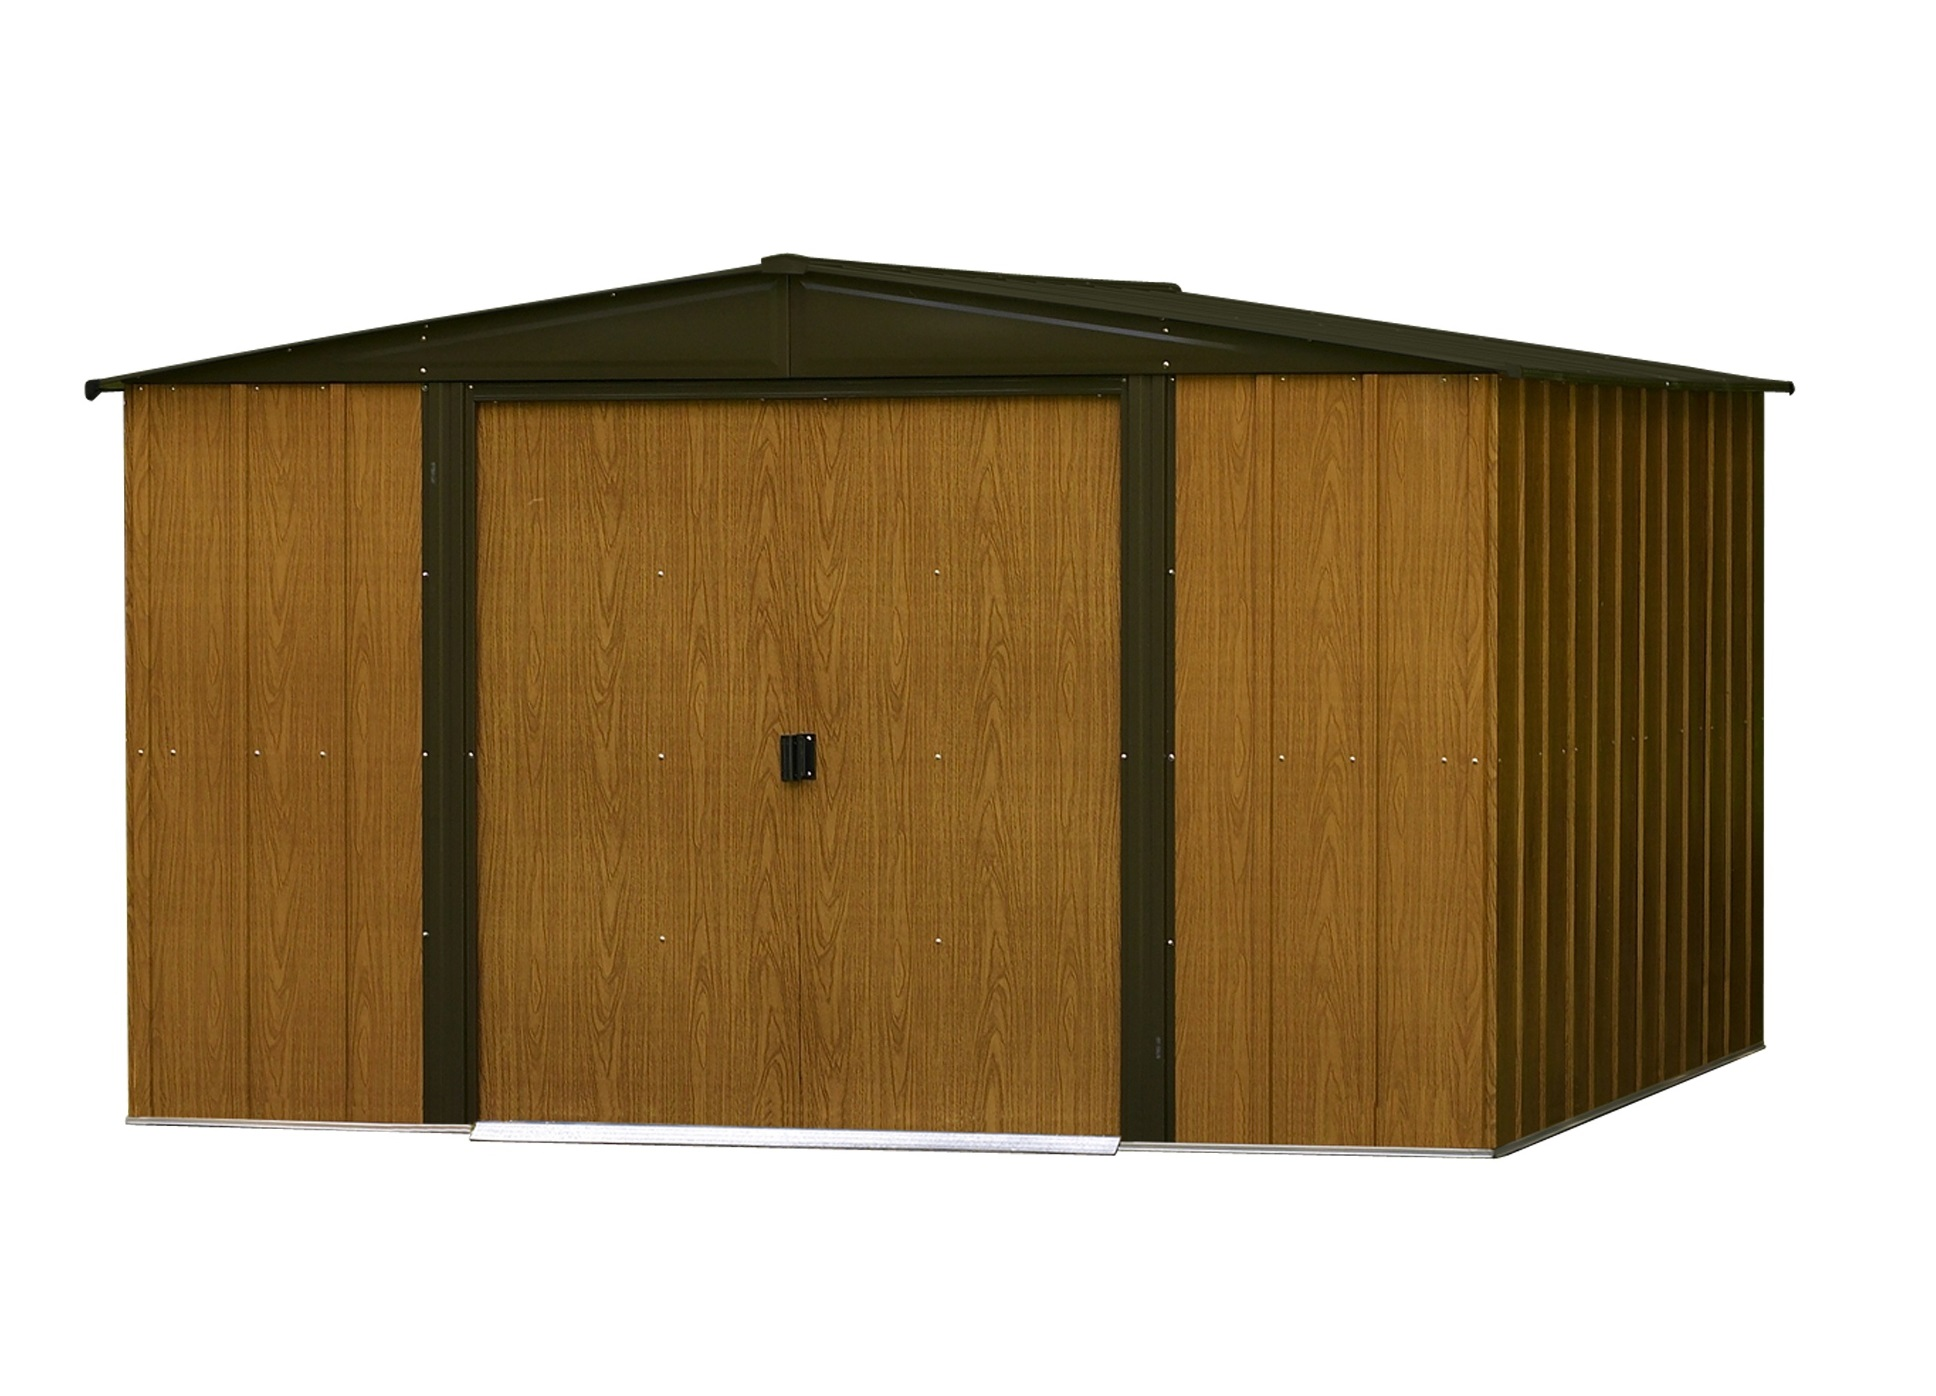 zahradní domek ARROW WOODLAKE 108